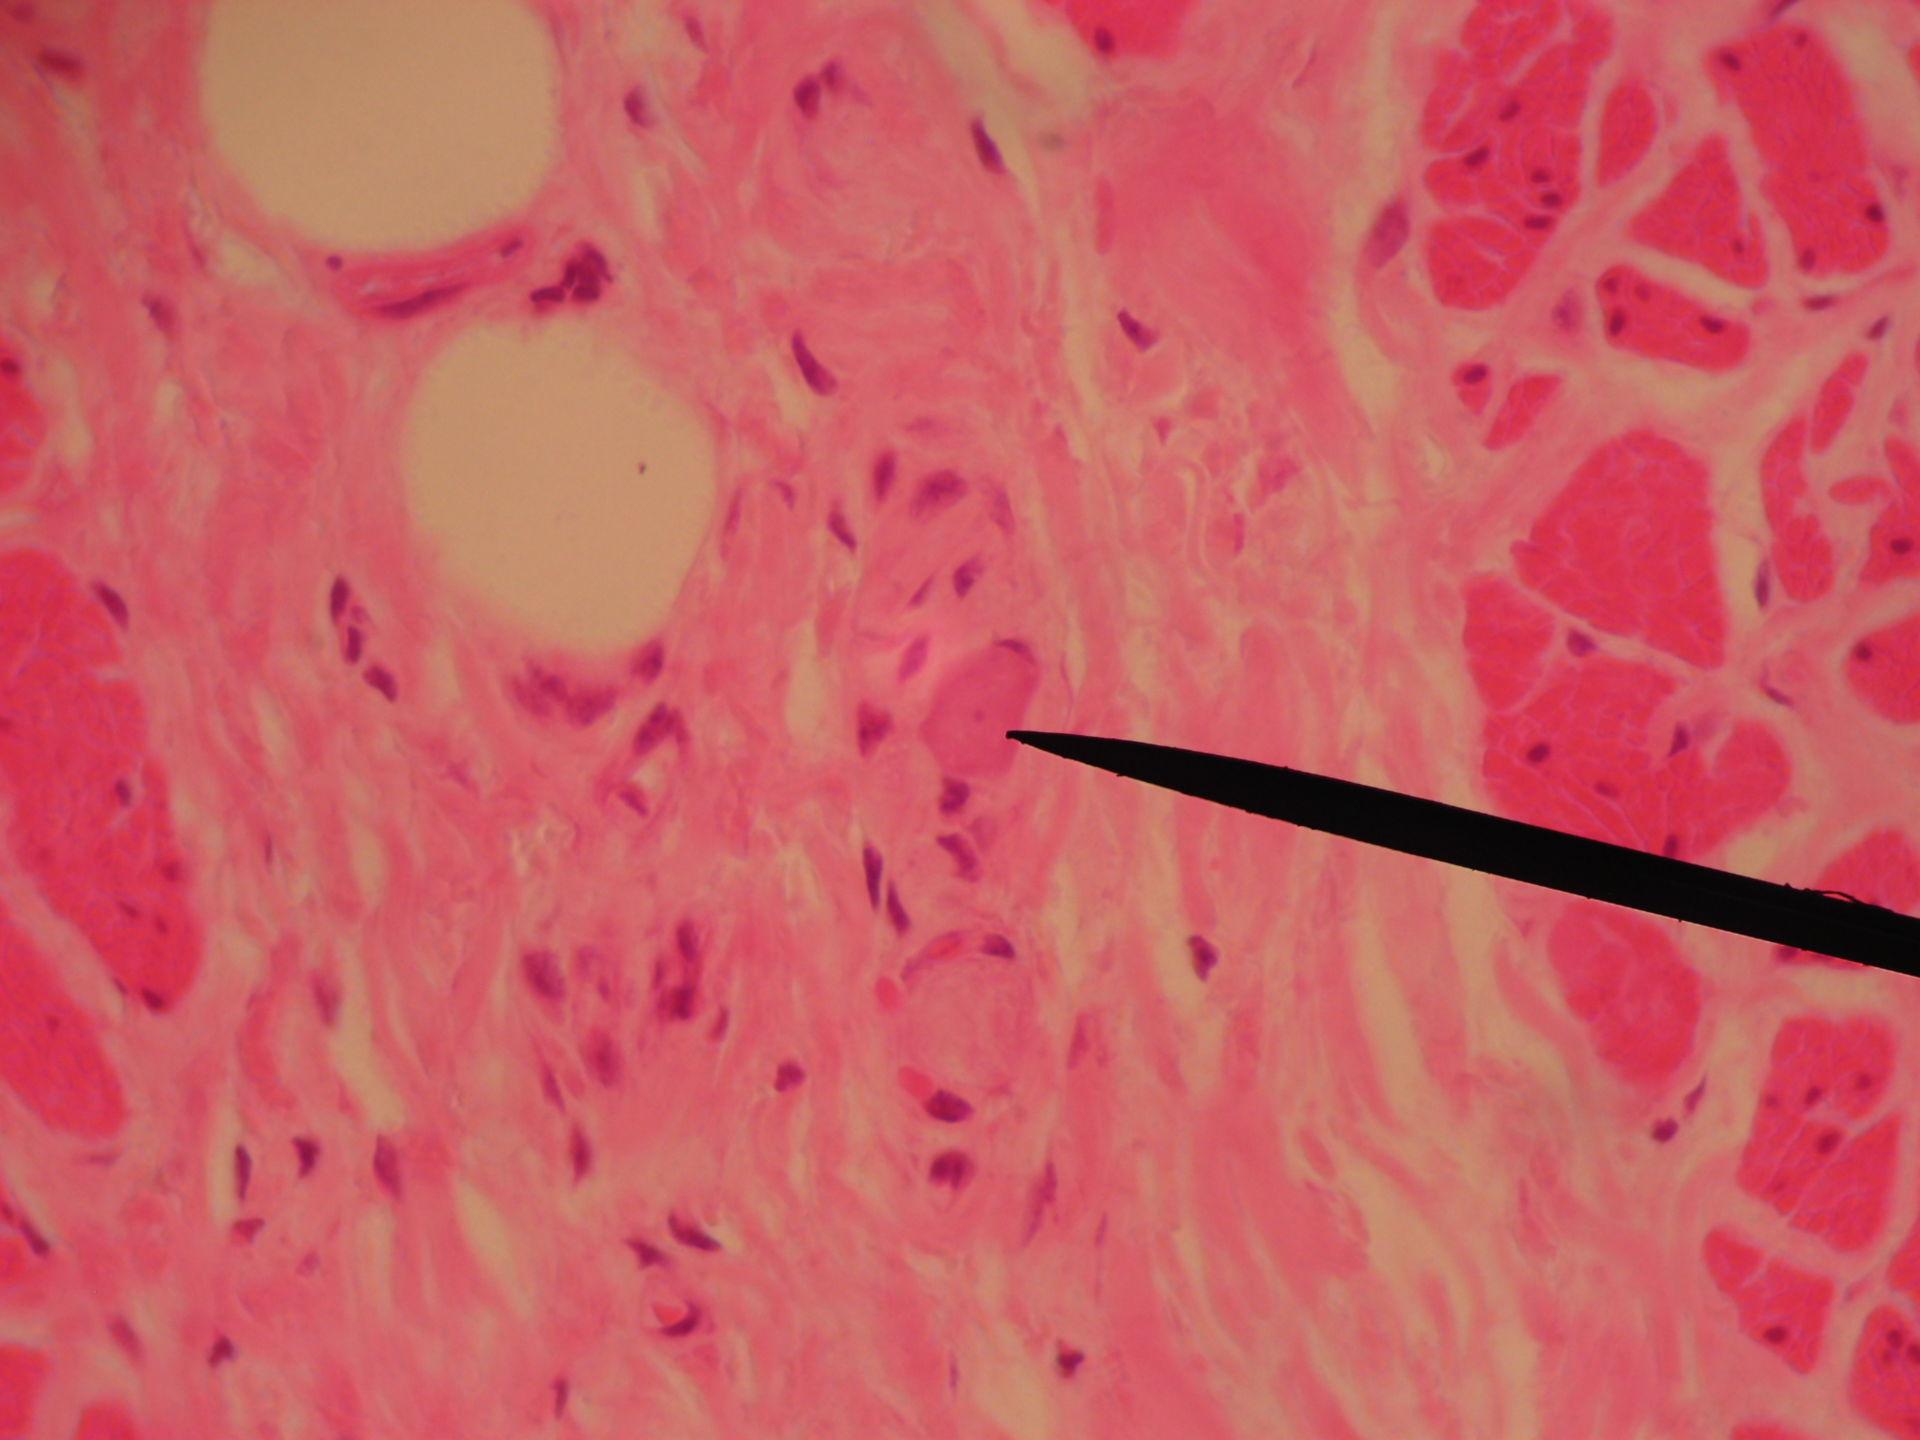 Veterinary medicine: Tela submucosa with Ganglion of the Meissner-Plexus